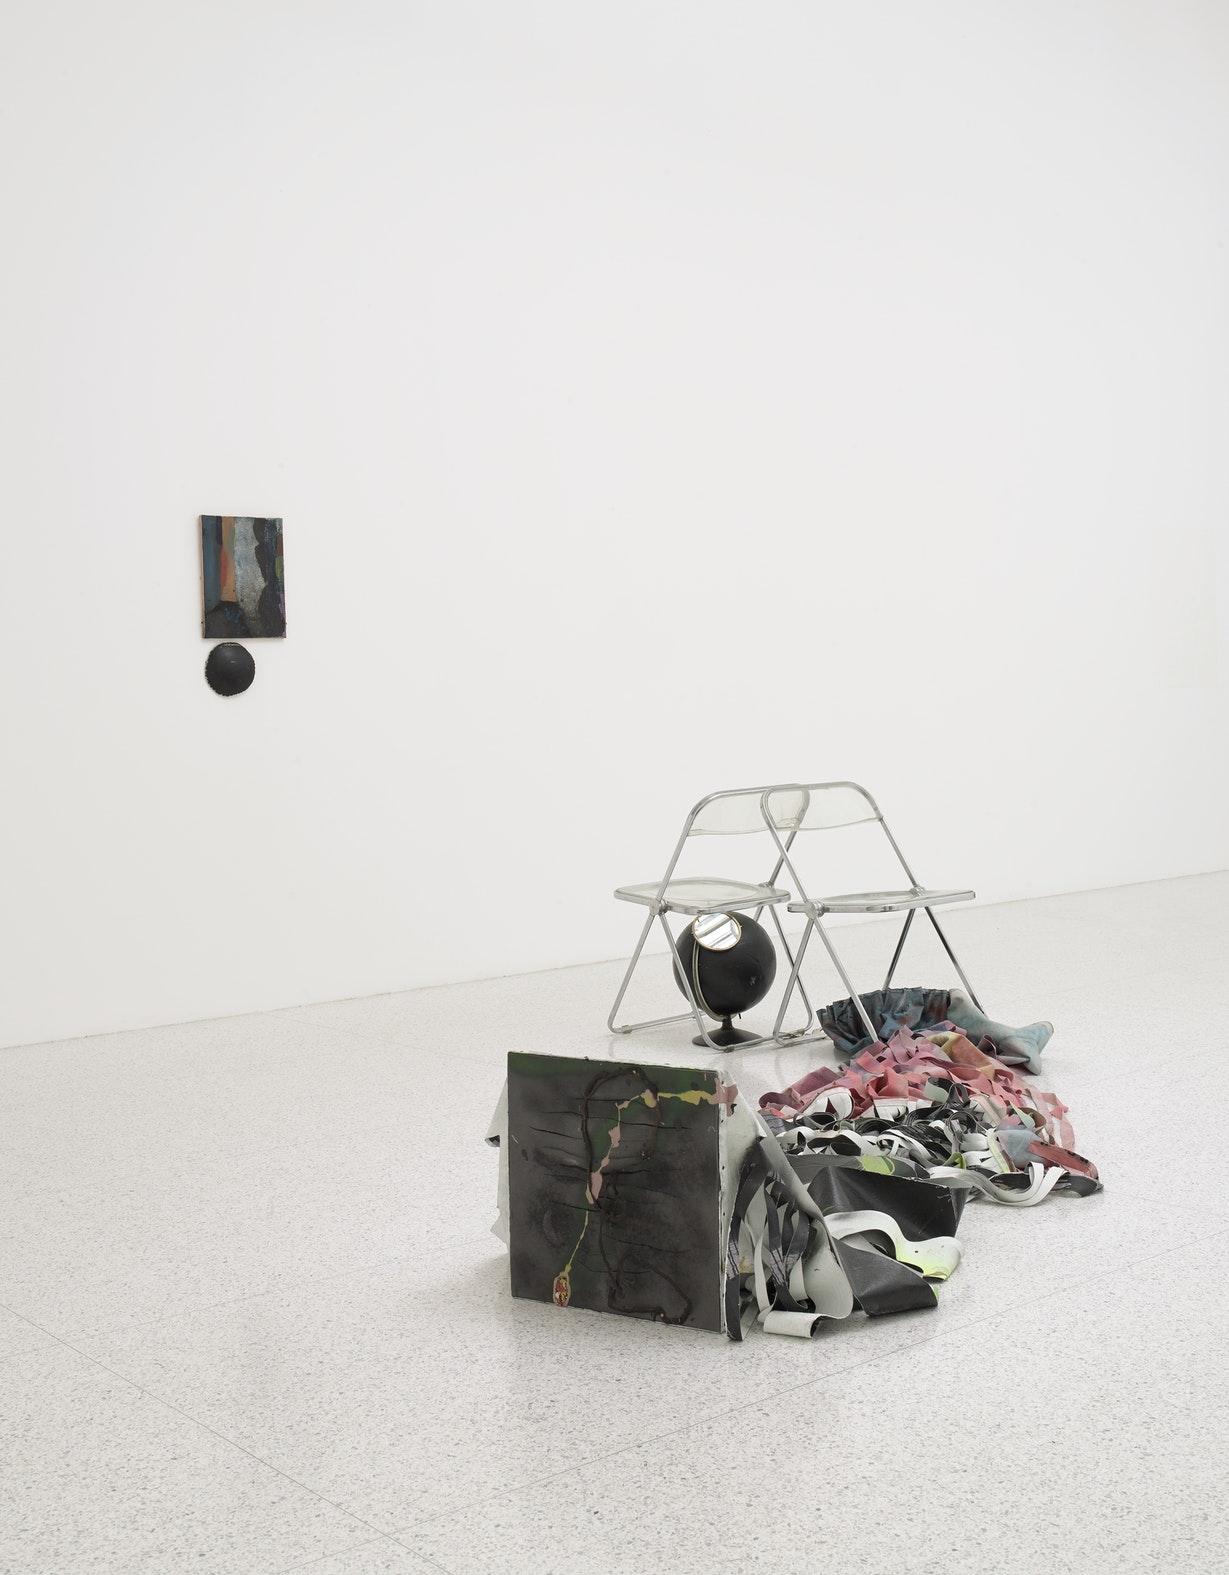 Molly-Zuckerman-Hartung-BlafferArtMuseum